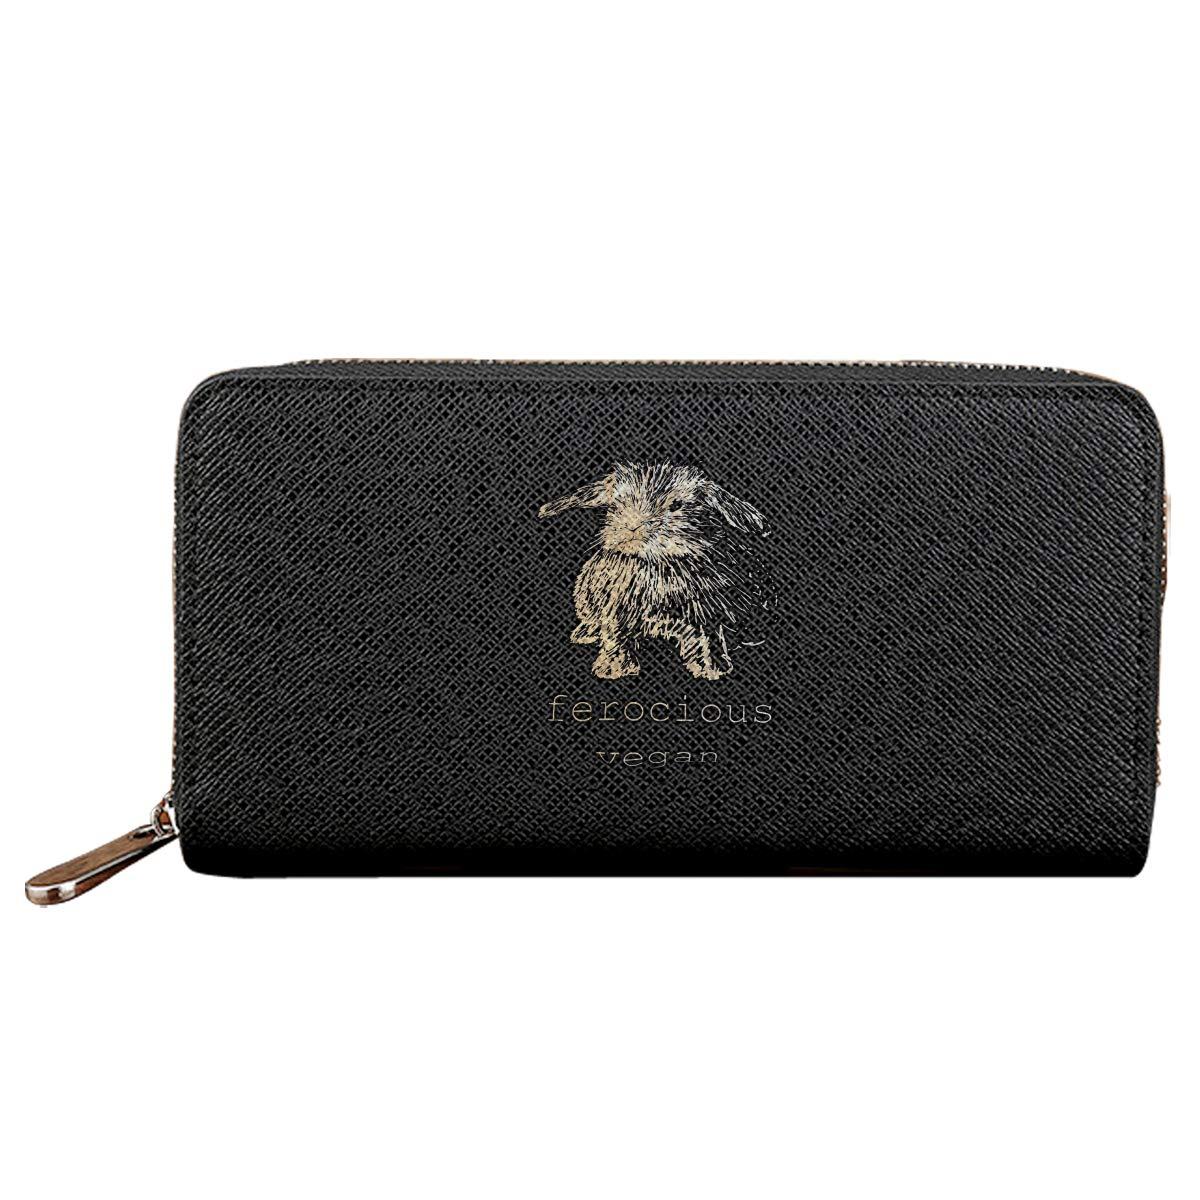 Ferocious Vegan Long Wallets For Men Women Leather Wallet Unique Zipper Wallet